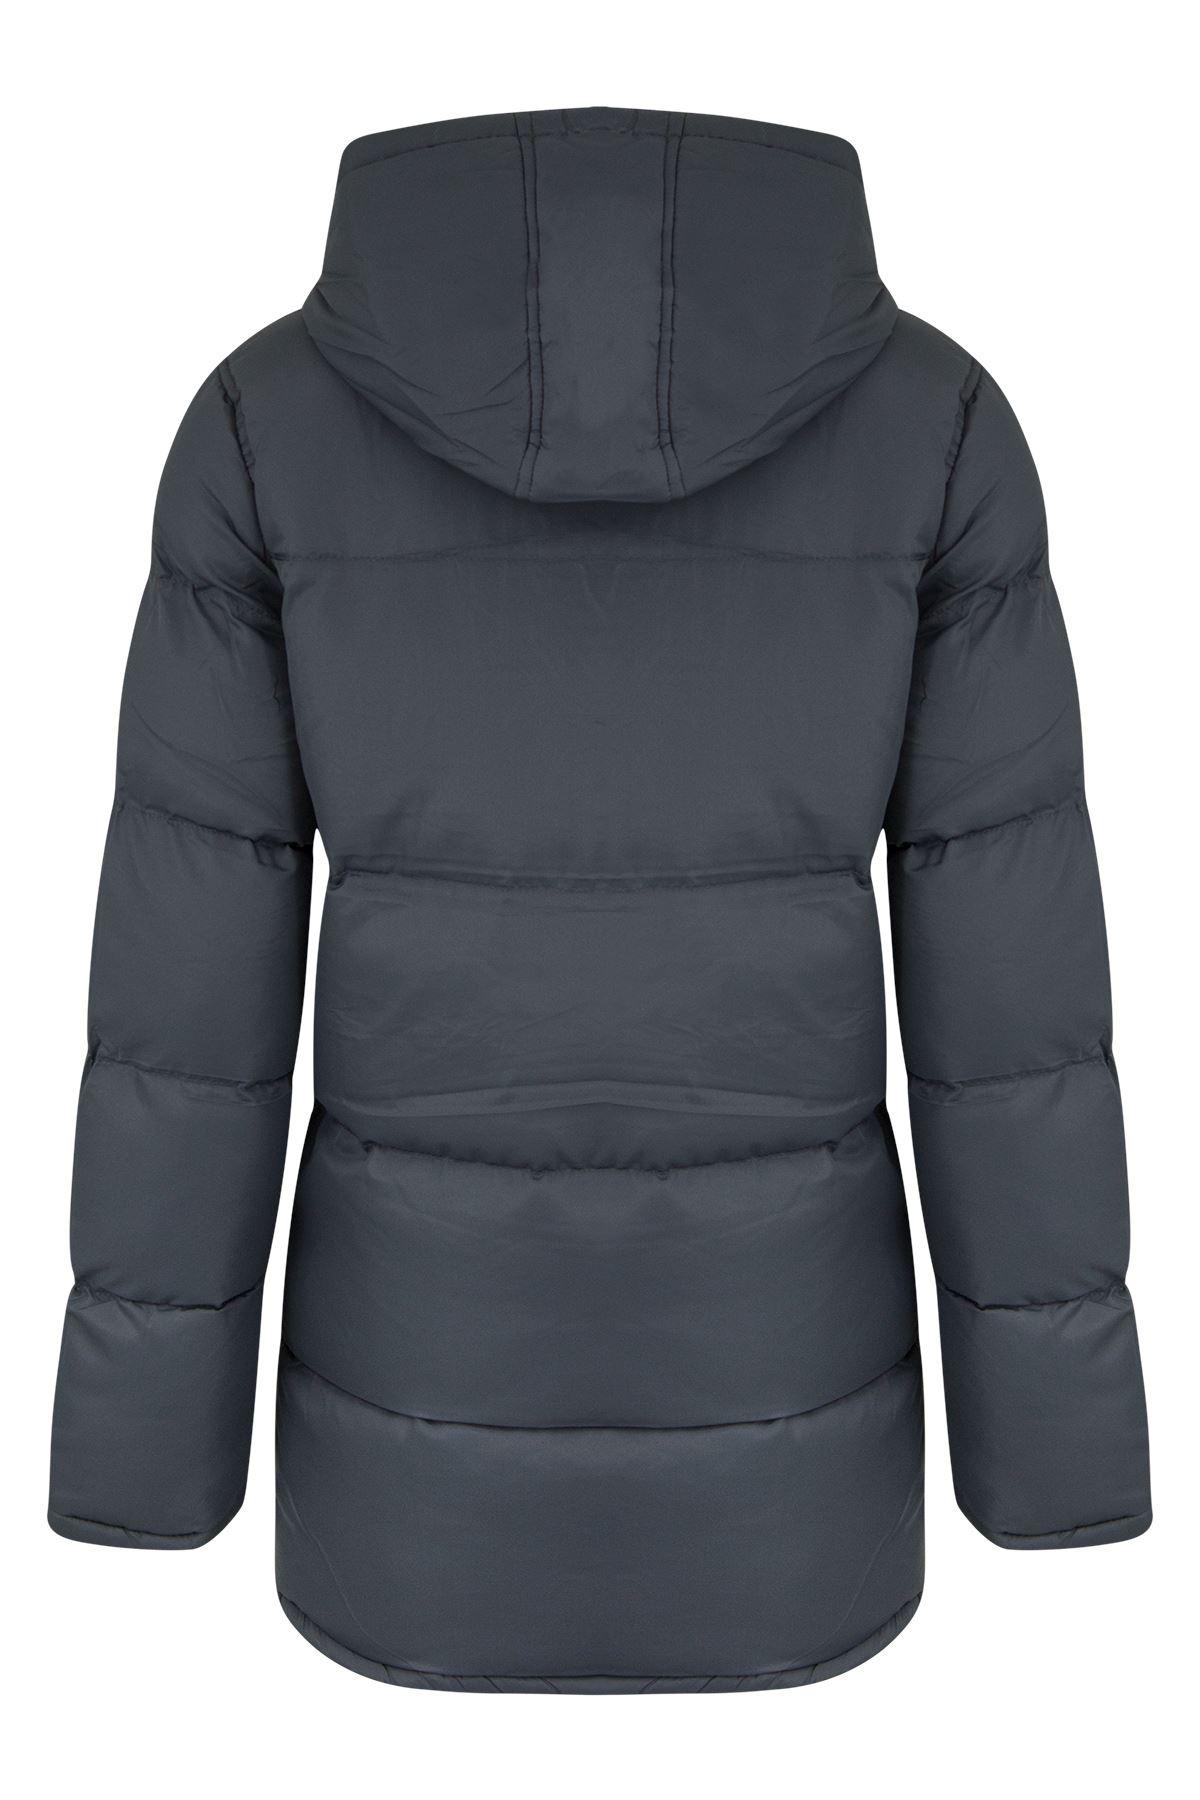 New Kids Boys Zipped Padded Hooded Warm Puffer Coat Parka Jacket